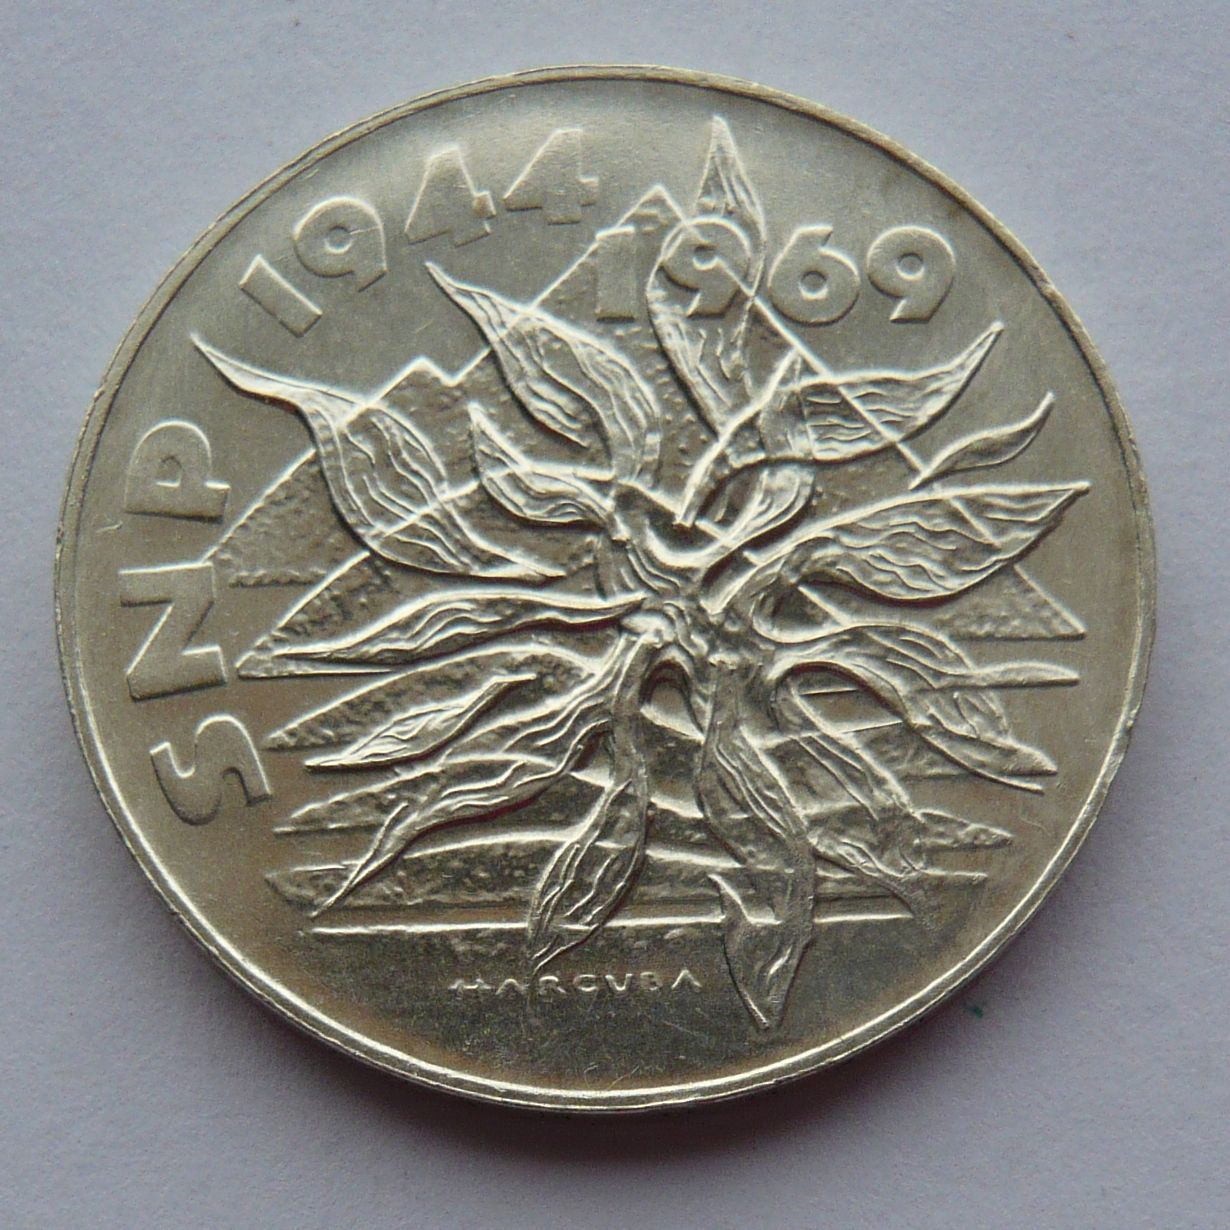 ČSSR 25 Kč SNP 1969